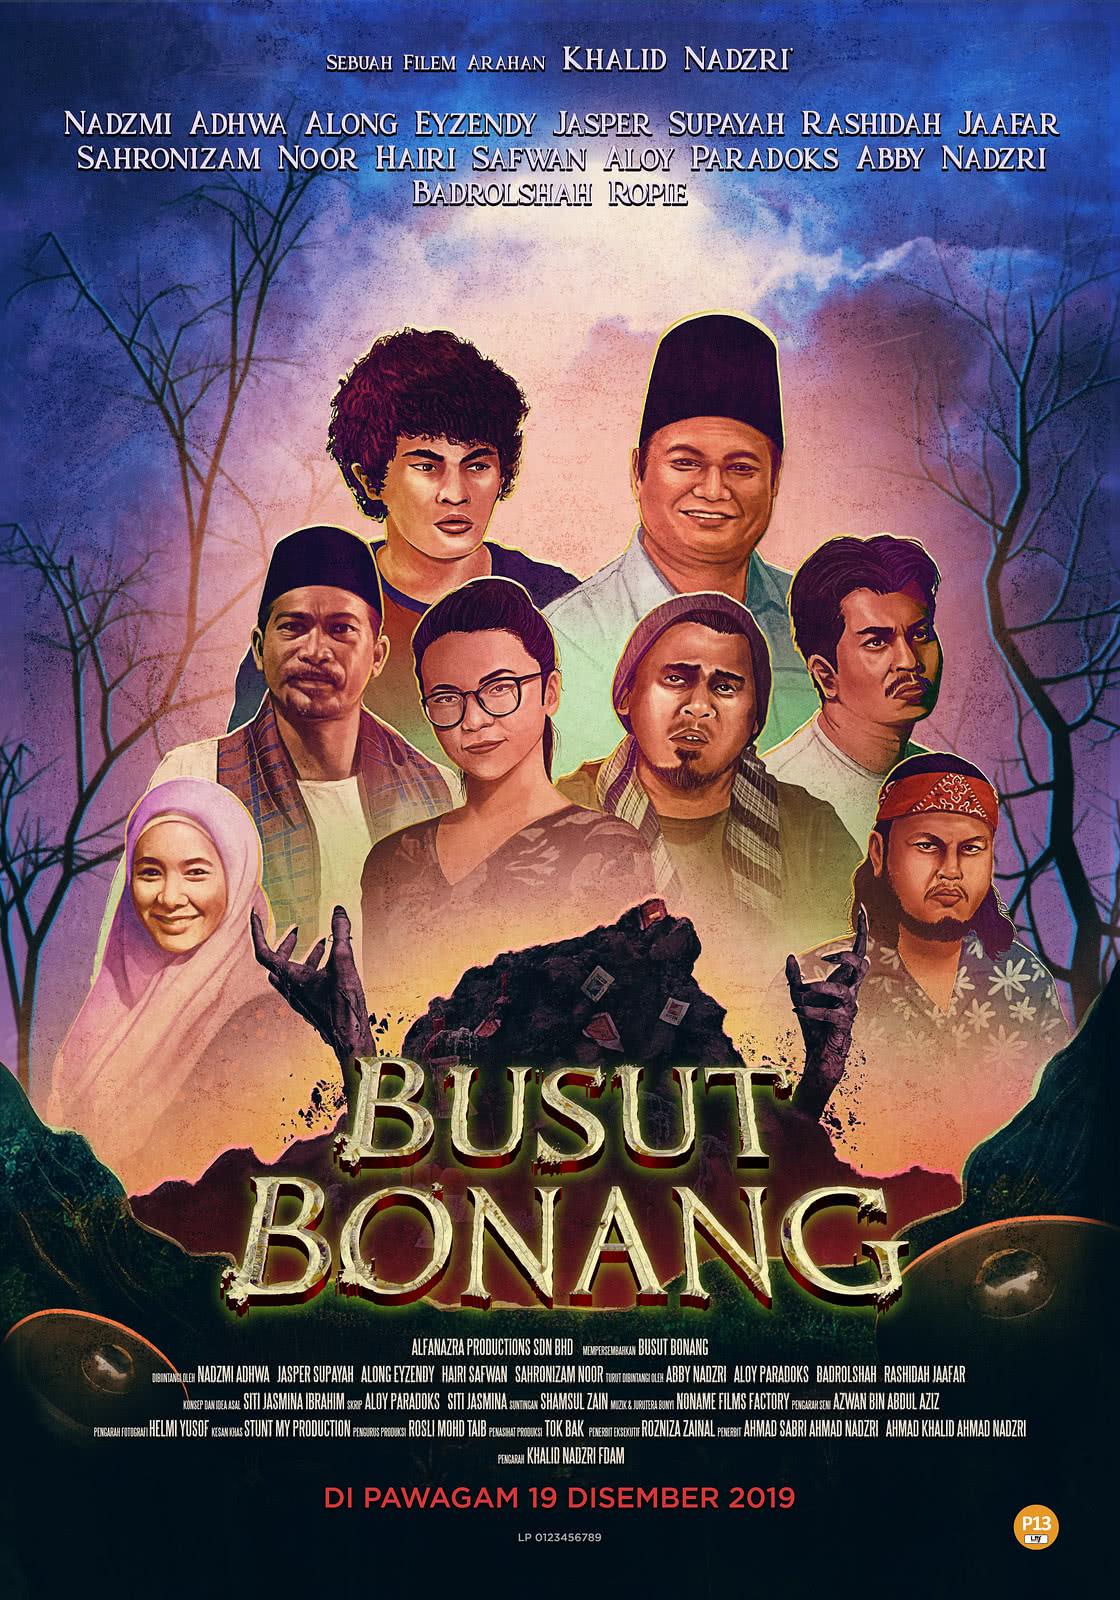 Busut Bonang (2019) Full Movie